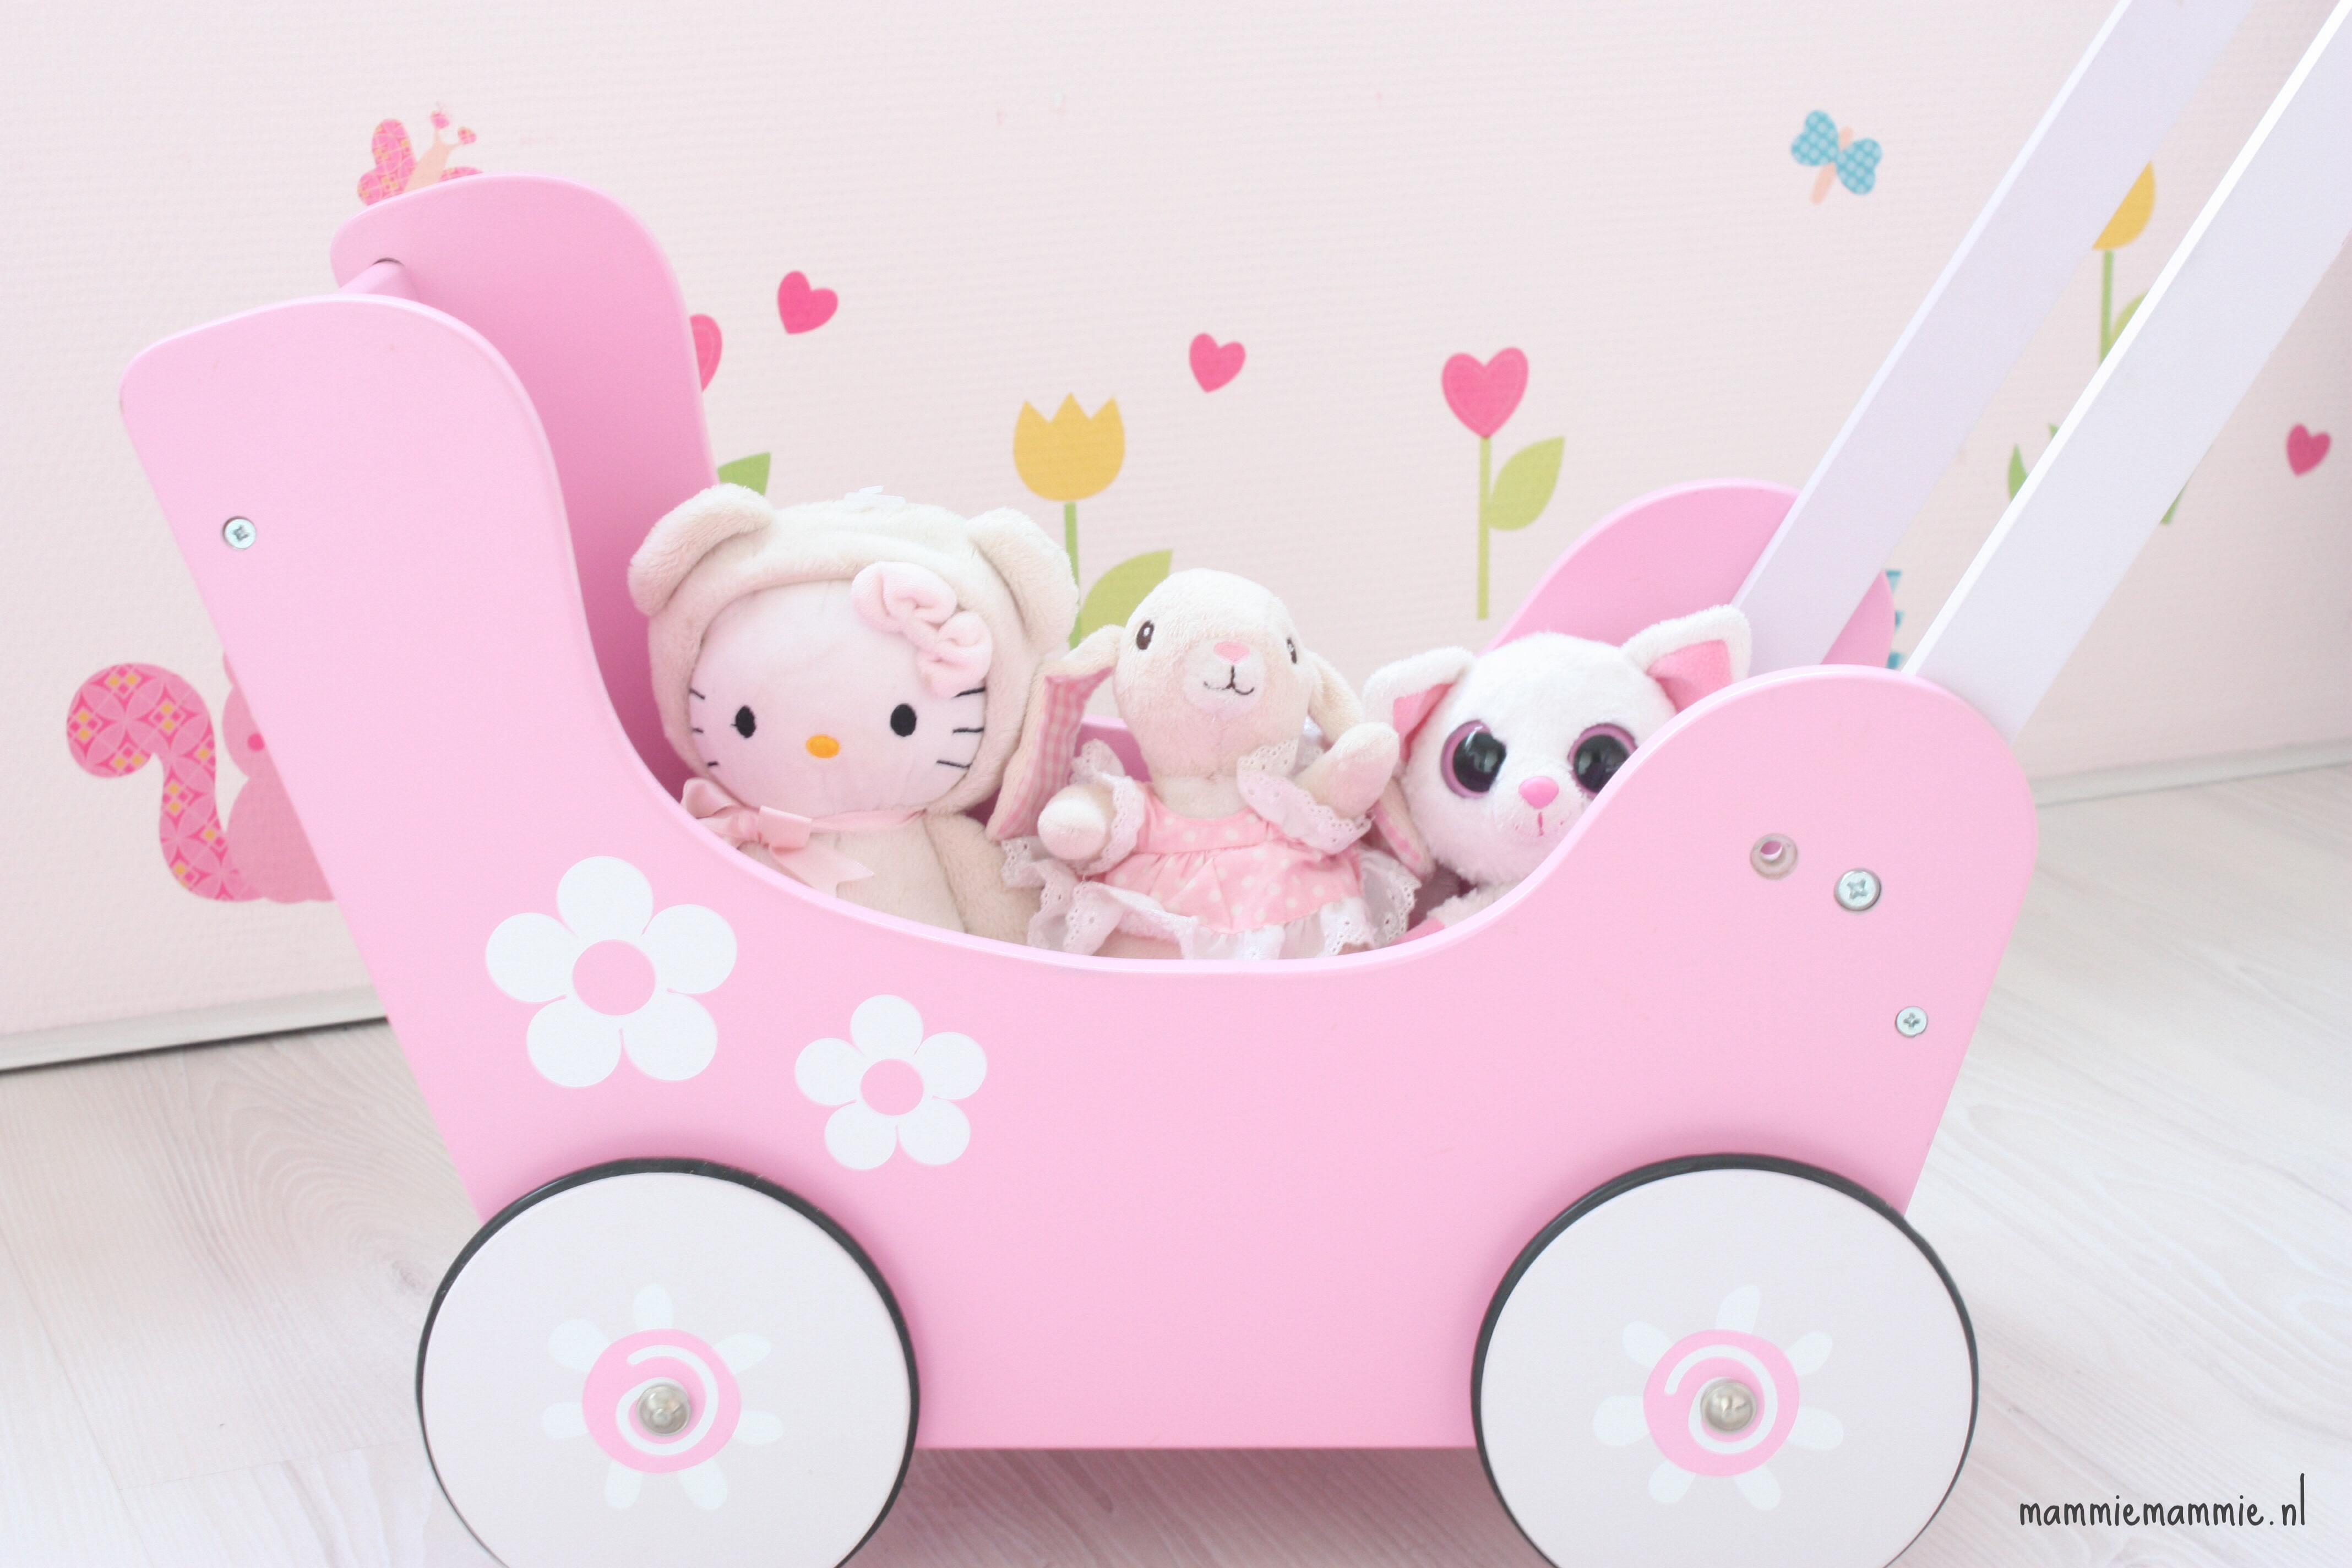 10 Cadeaustips Voor De Eerste Verjaardag Mammie Mammie Mama Blog